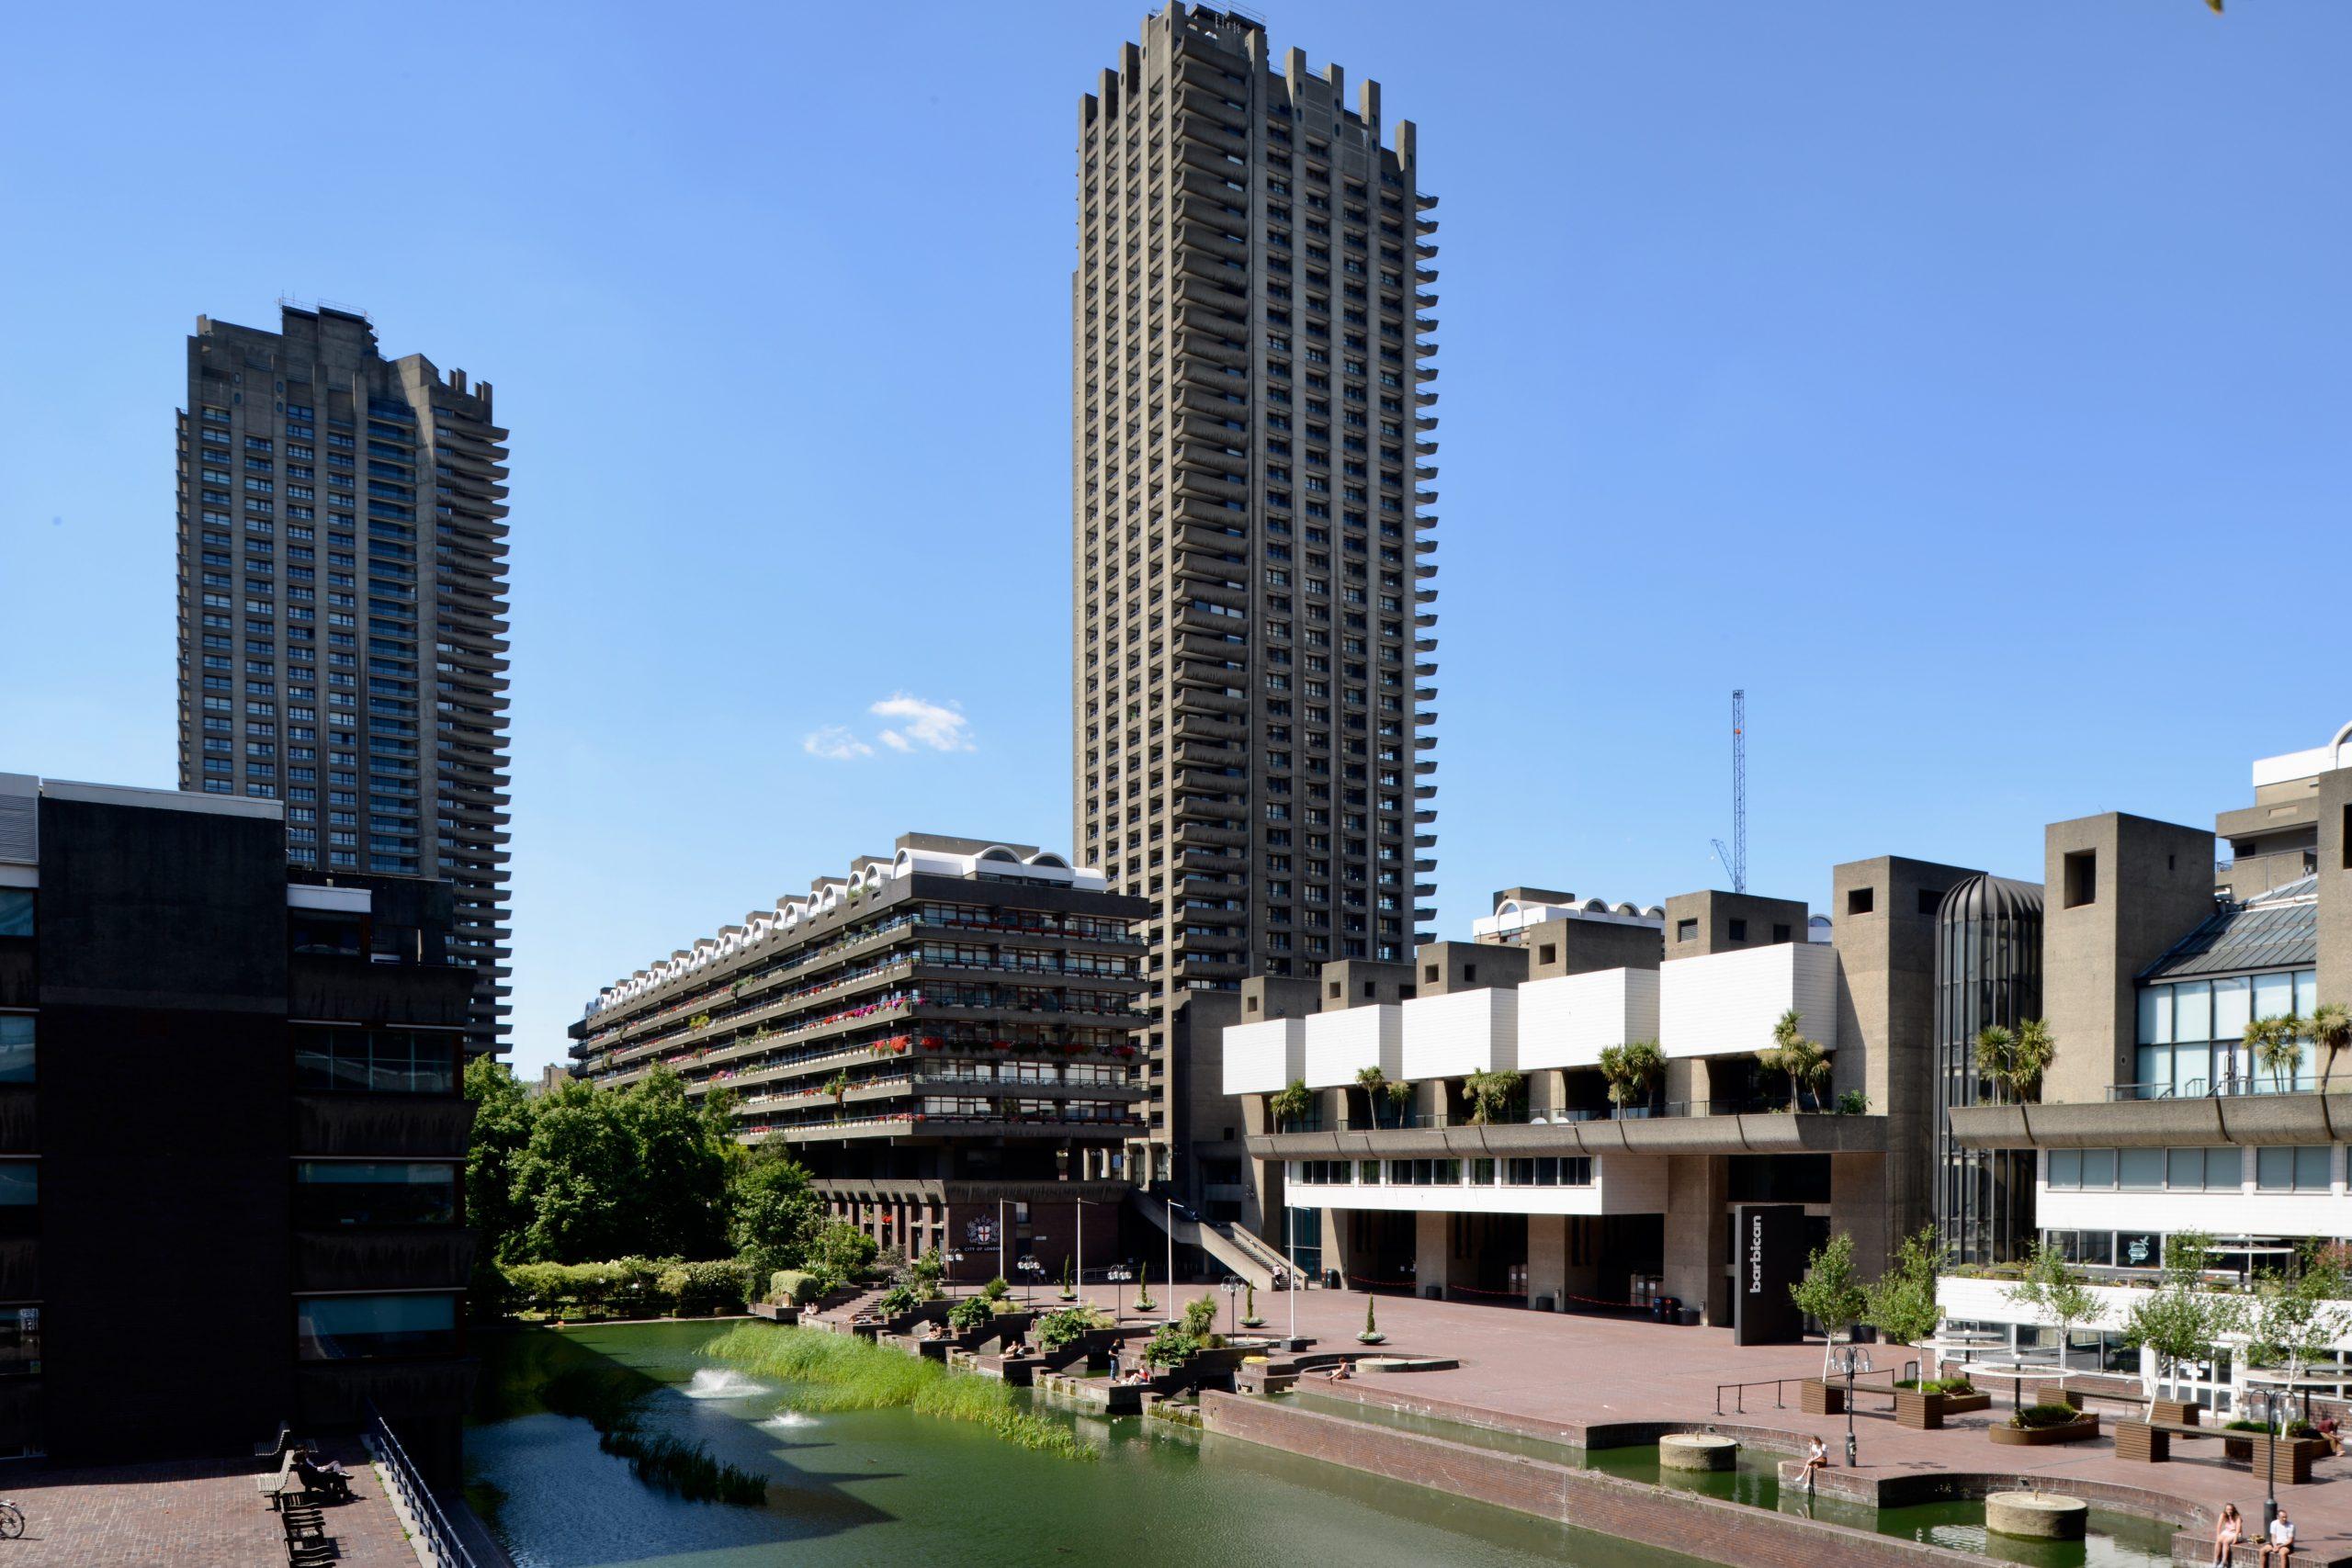 The Barbican, Elain Harwood